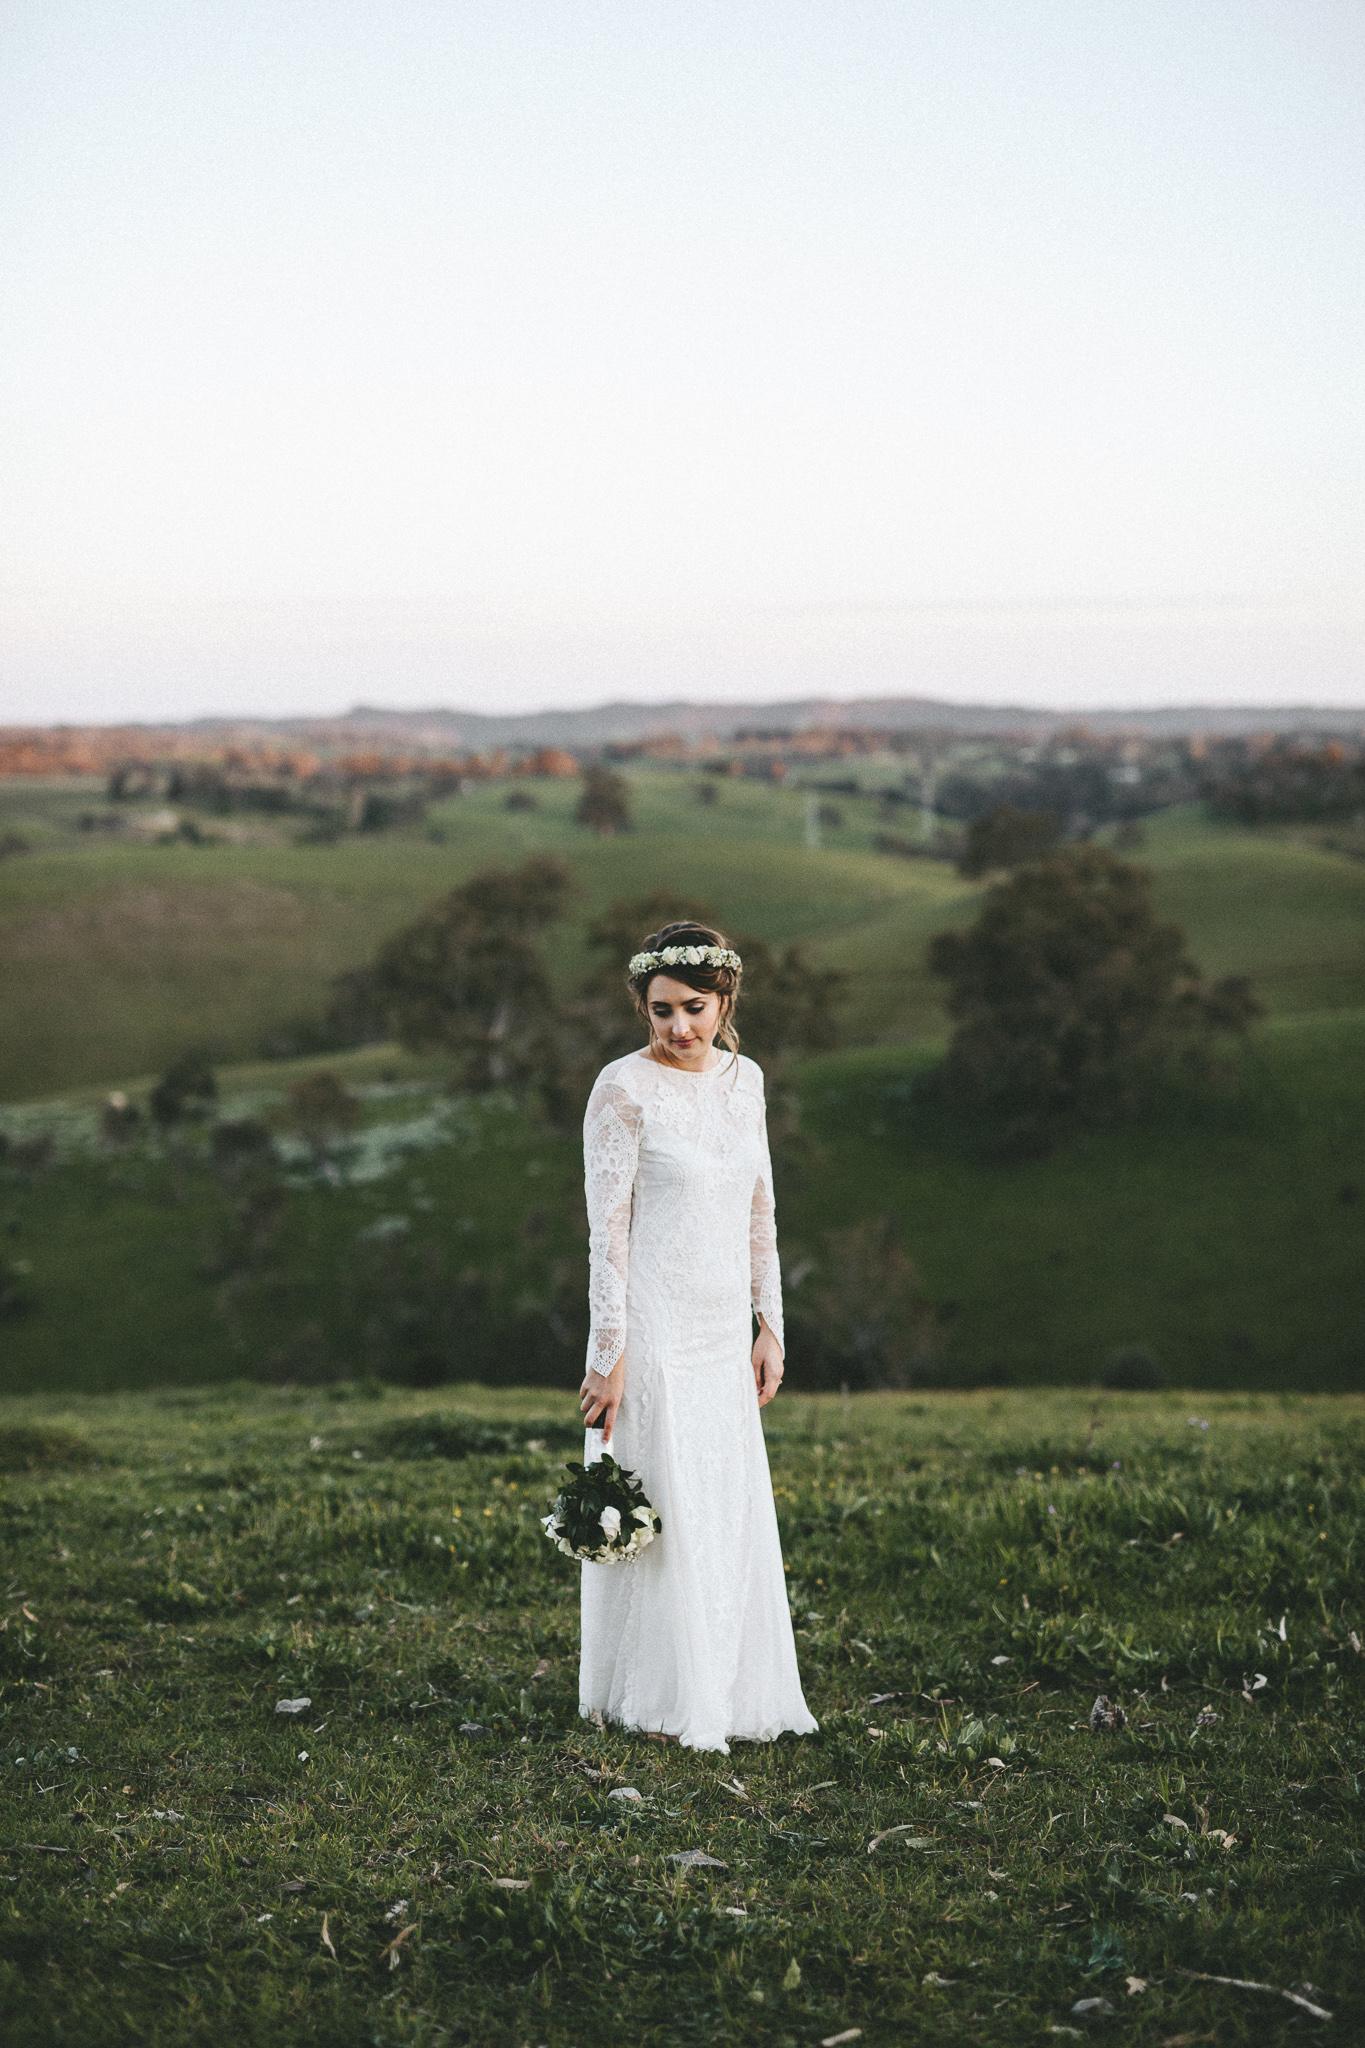 christopher morrison_adelaide hills wedding_ andy + teegan_97_1147.jpg